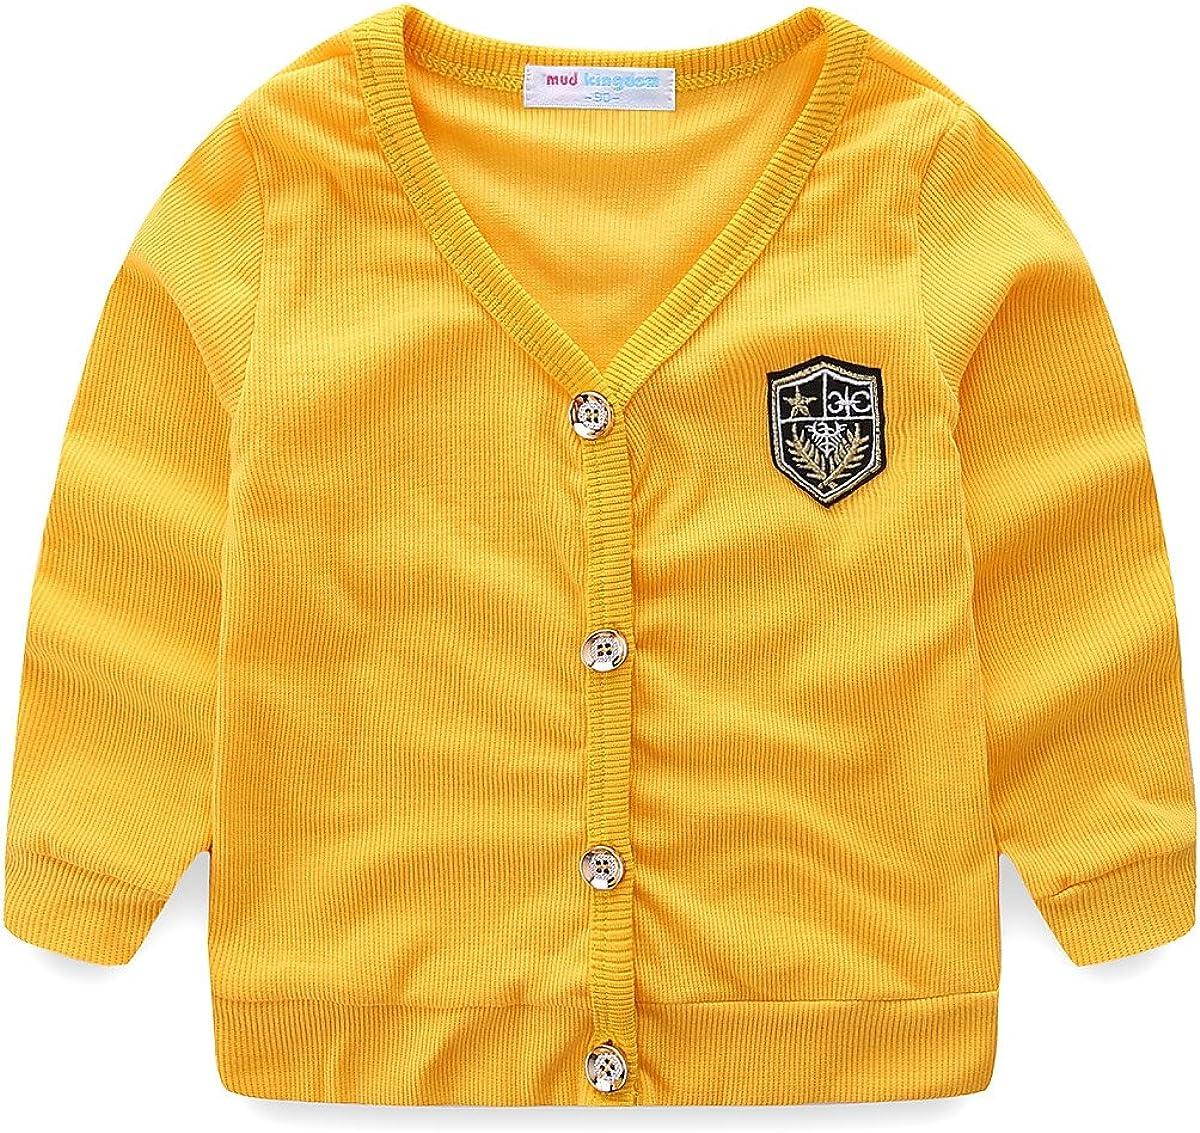 UWESPRING Kids Boys England Style V-Neck Cardigan Knit Sweater Coats 6T Yellow